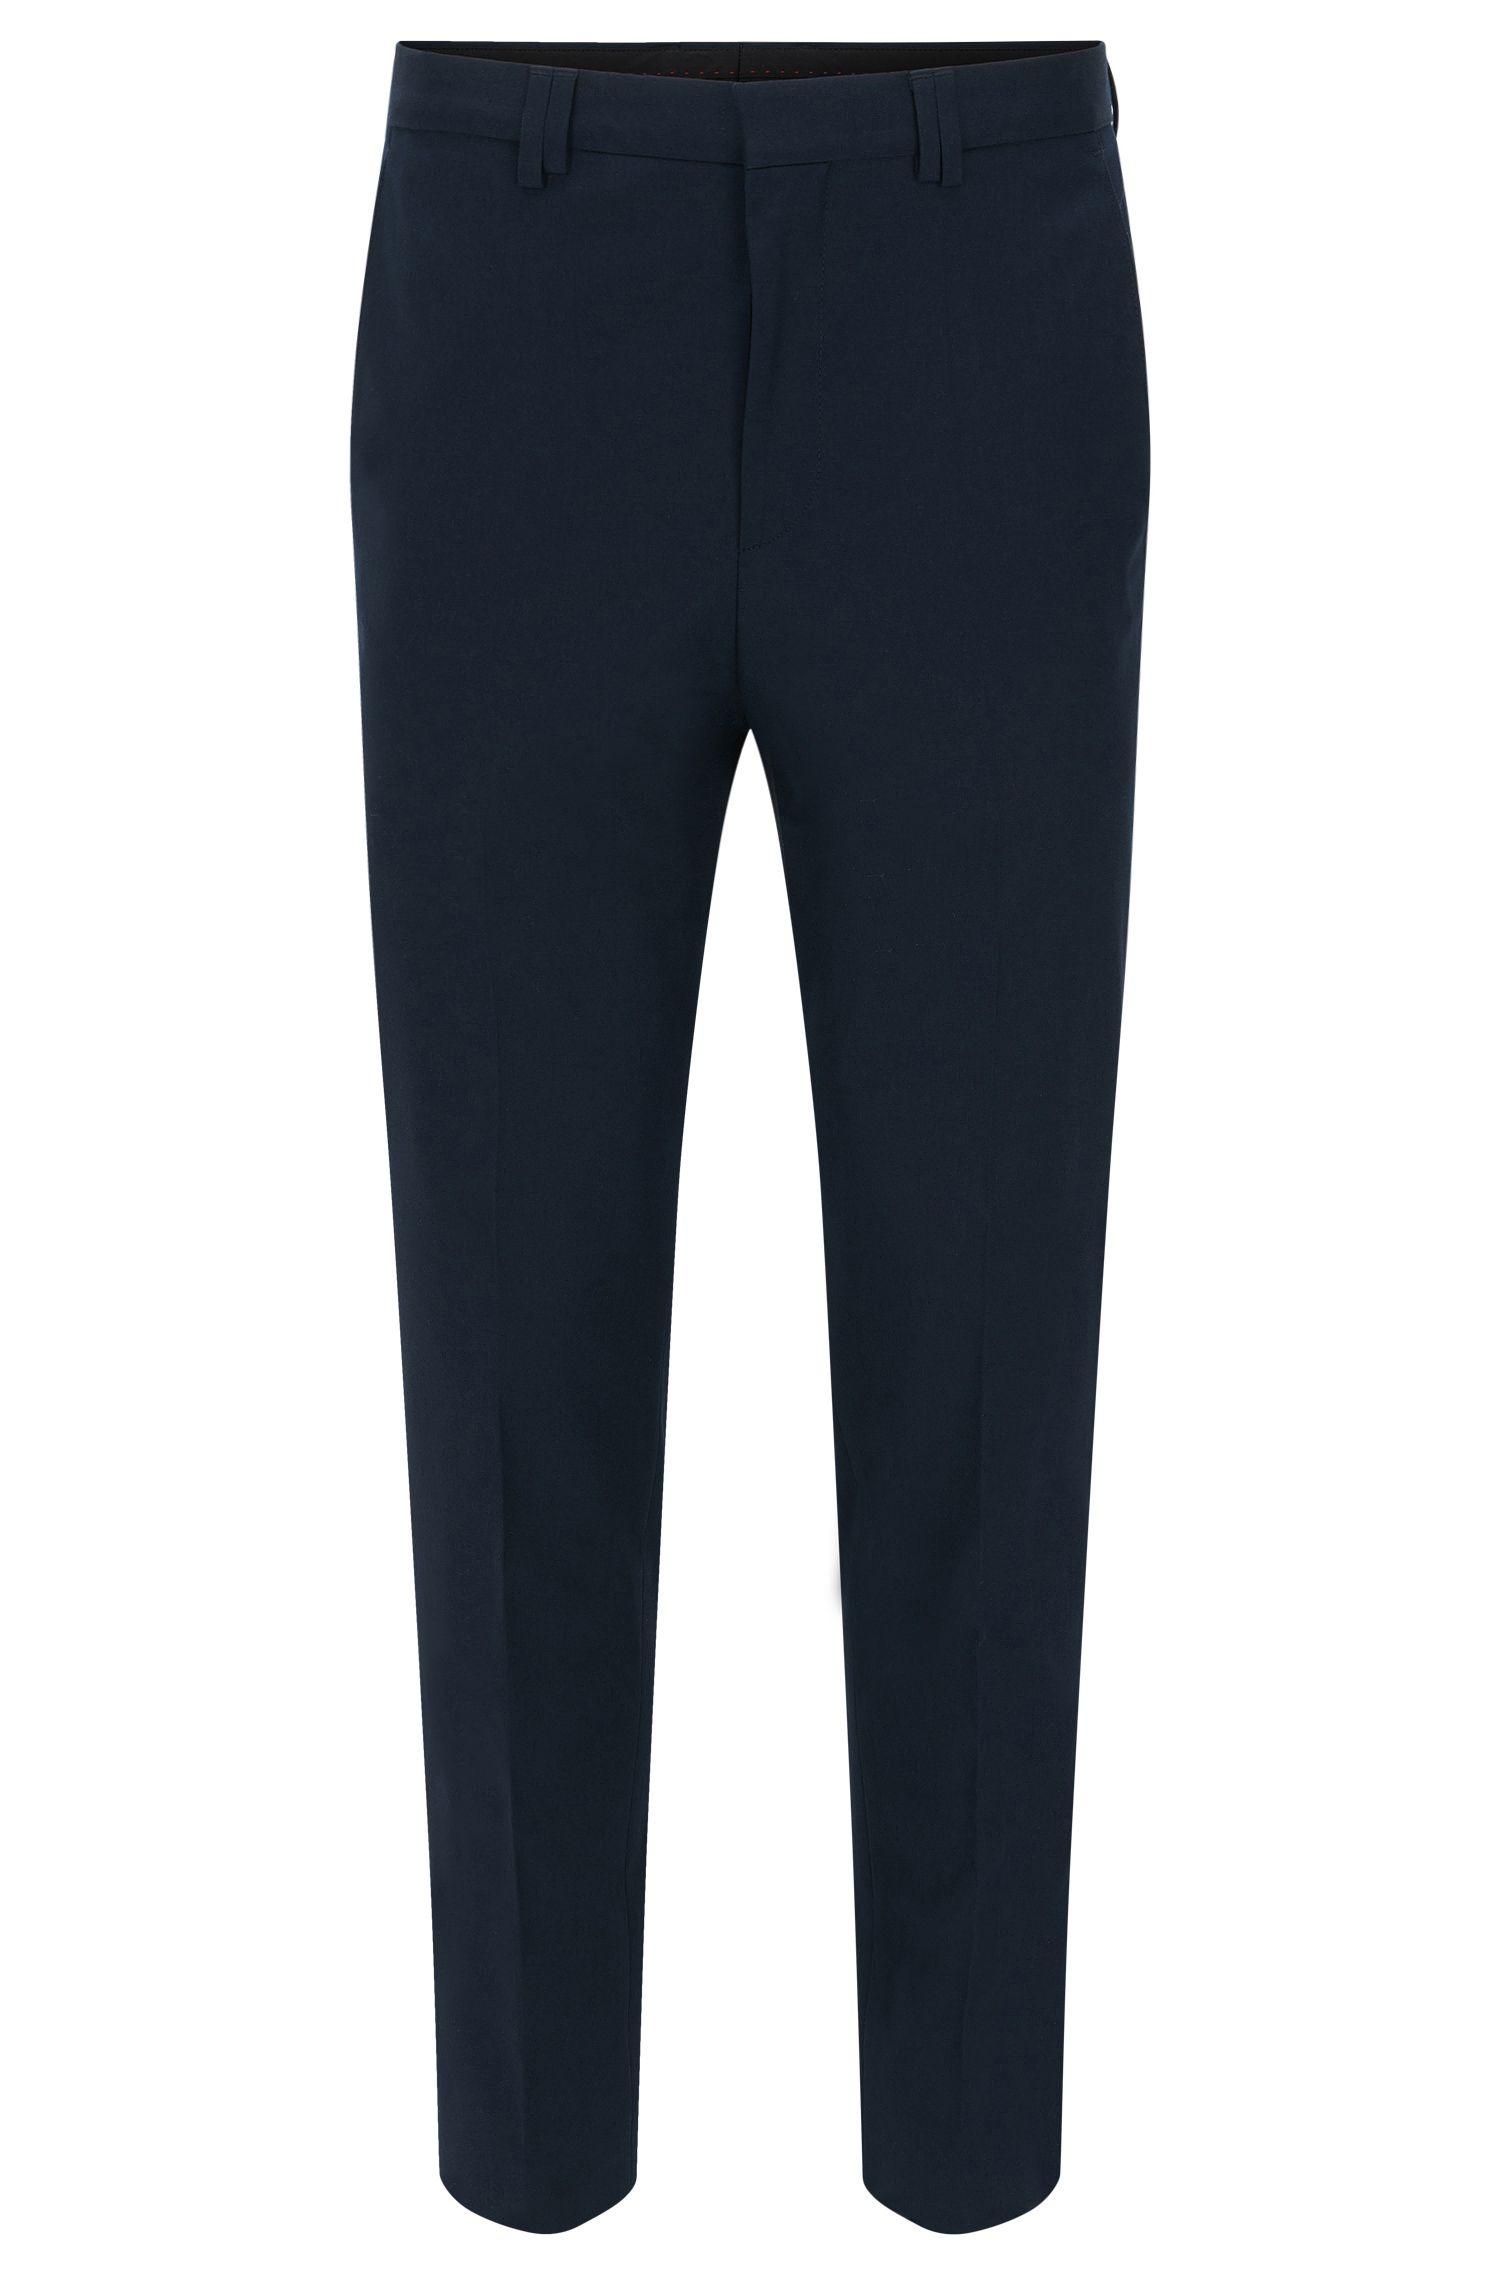 Unifarbene Slim-Fit Hose aus Stretch-Baumwolle: 'Herin'